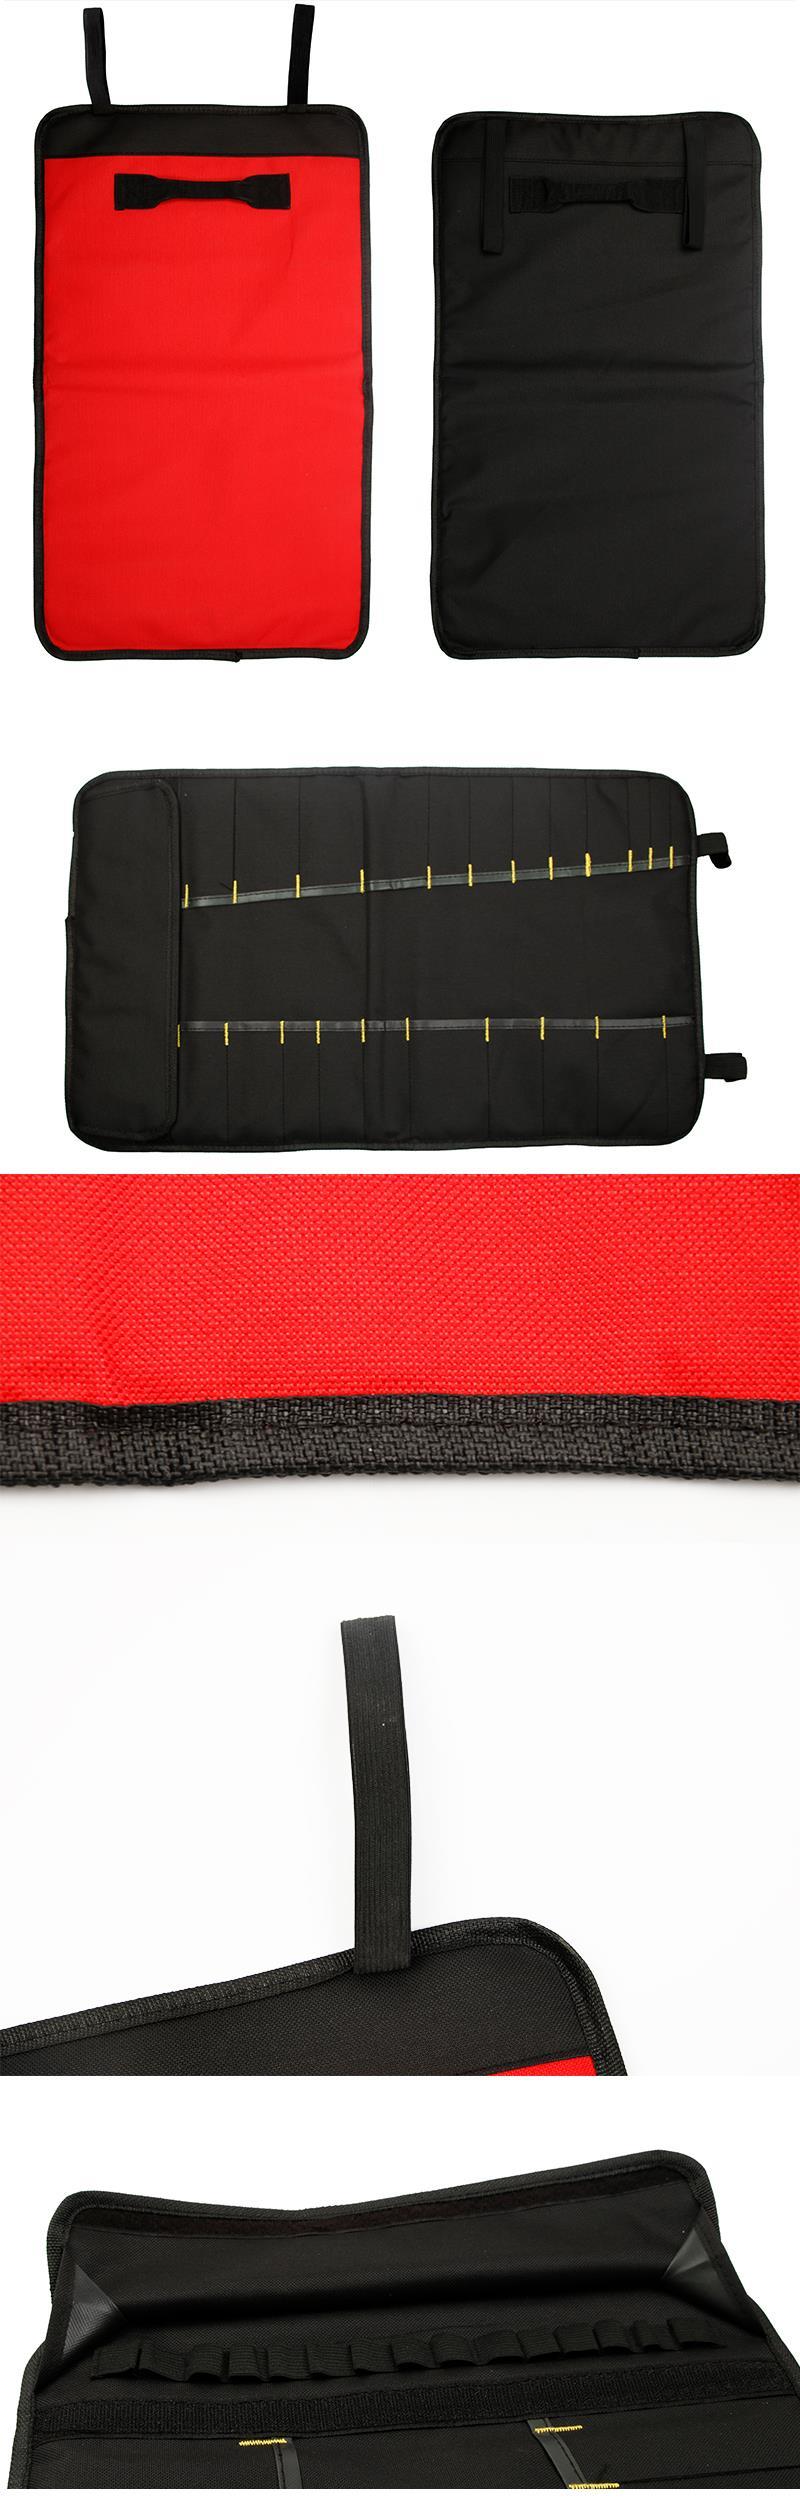 6 Car Repair Tool Bag Organizer Storage Protable Tool Trunk Bags Folding Box Automobile Tidy Pocket Car Accessories In Car-styling